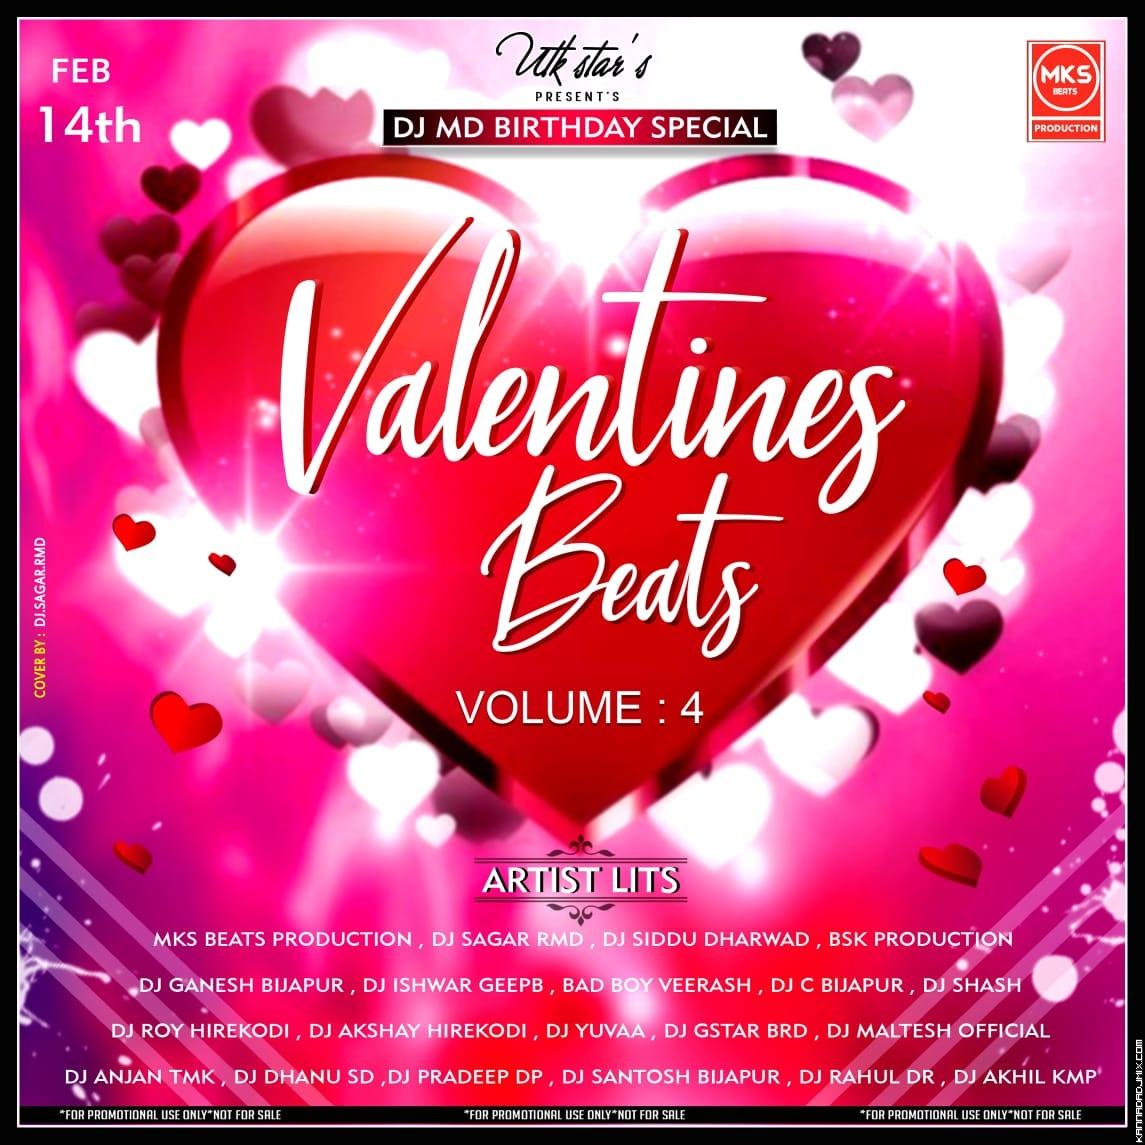 8-NAN YEDE BADIGE REMIX -DJ GANESH BIJAPUR x BAD BOY VEERASH.mp3